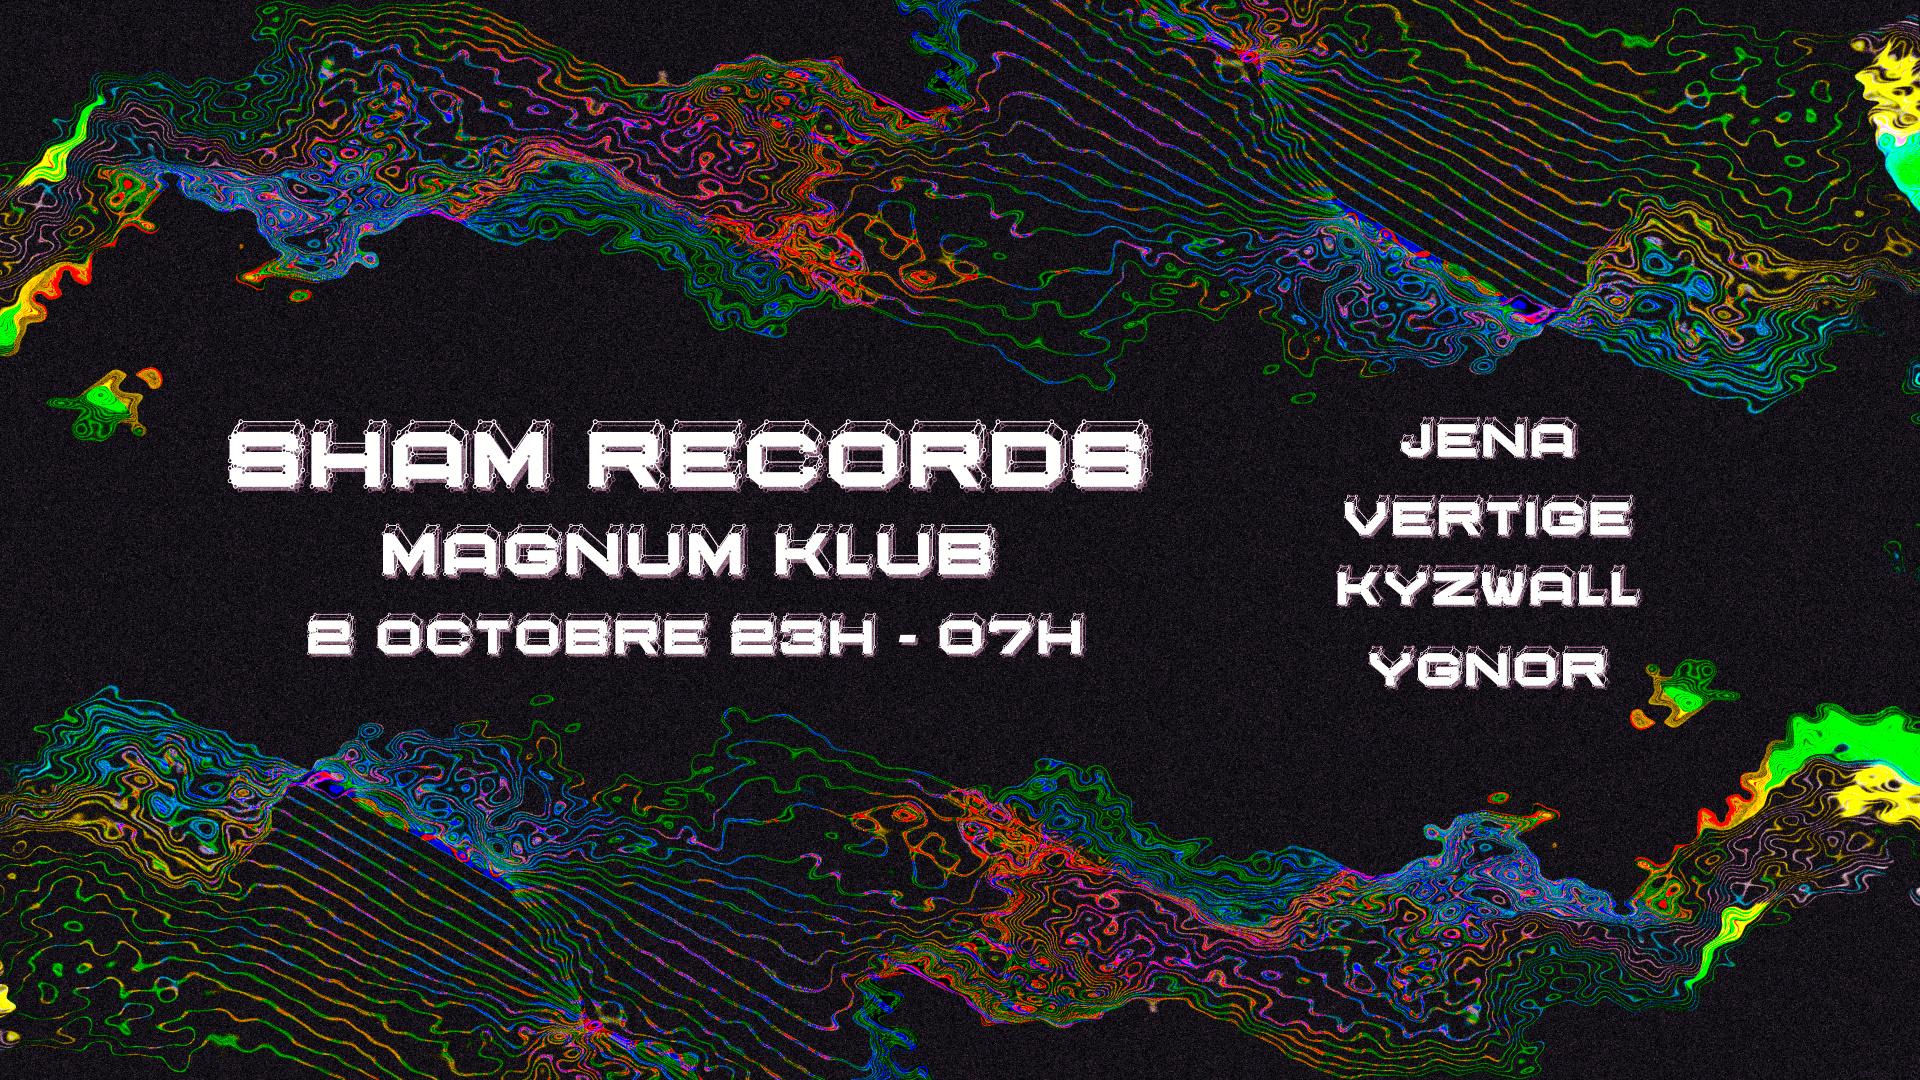 SHAM RECORDS - Magnum Klub : Kyzwall/Jena/Vertige/Guest : Ygnor